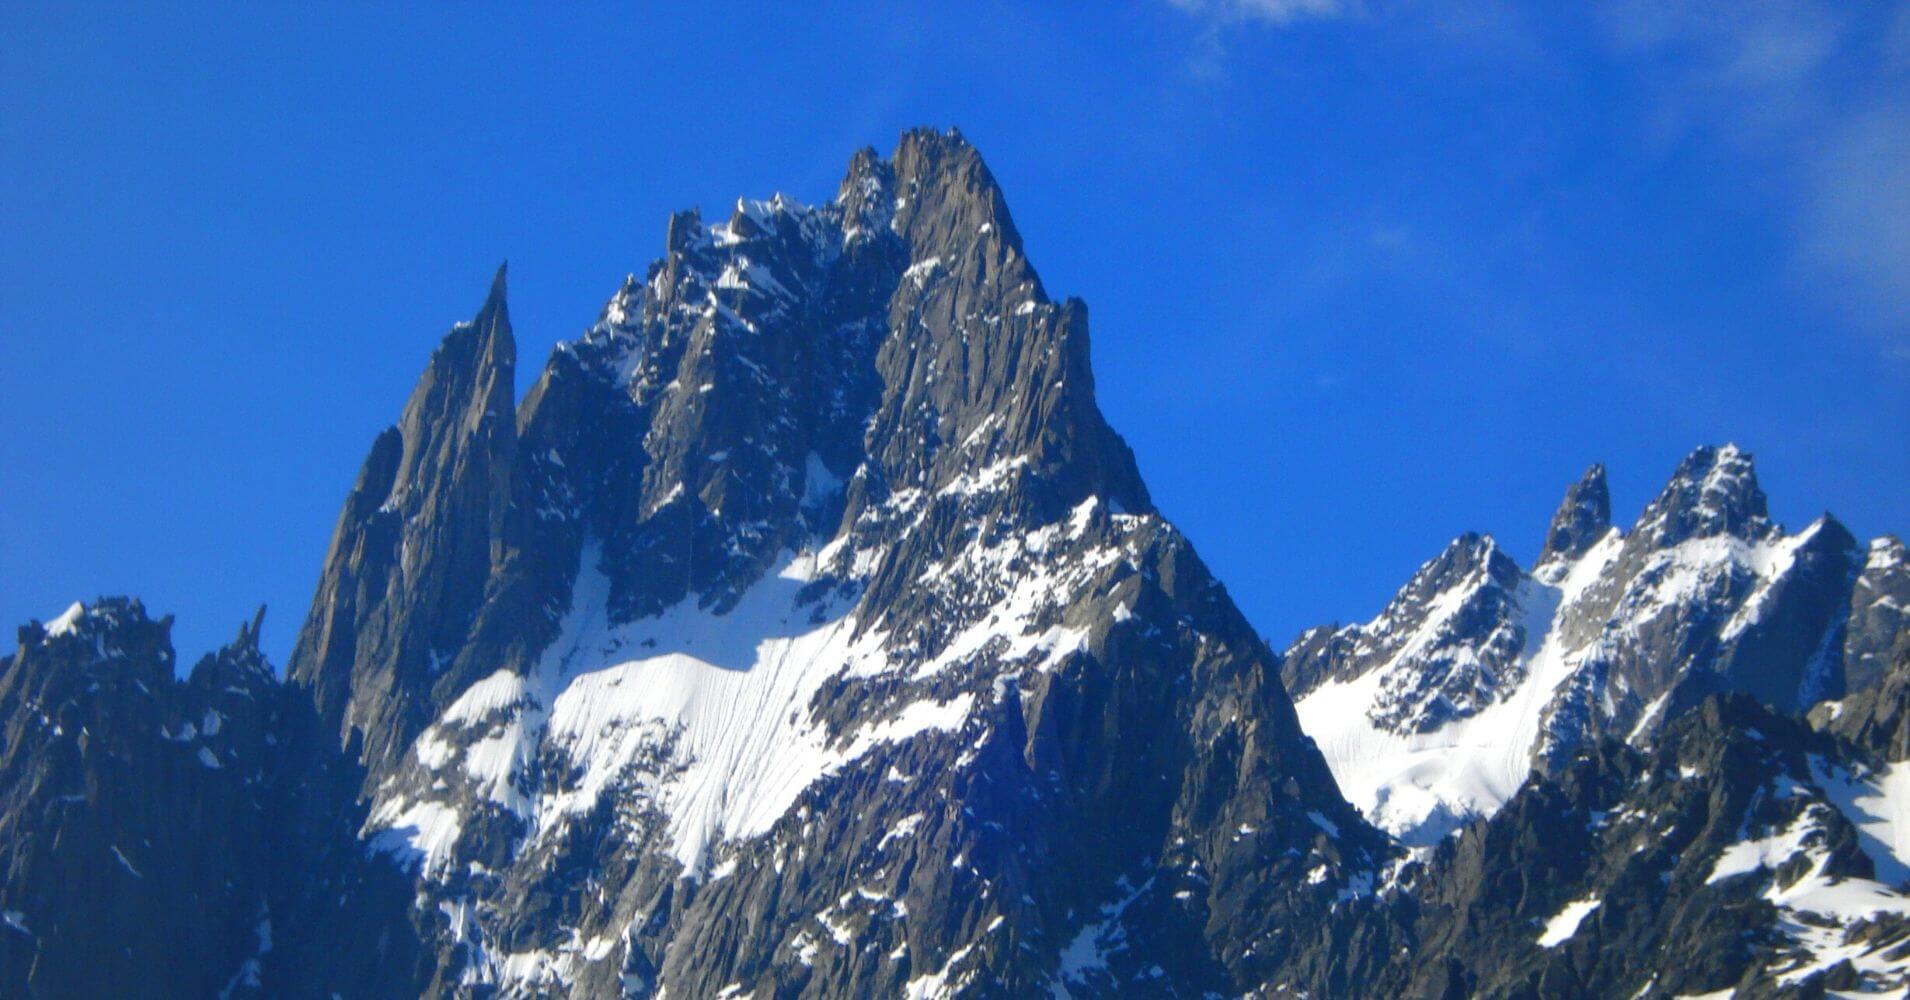 Cordillera de los Alpes. Tour del Mont Blanc. Suiza, Francia, Italia.